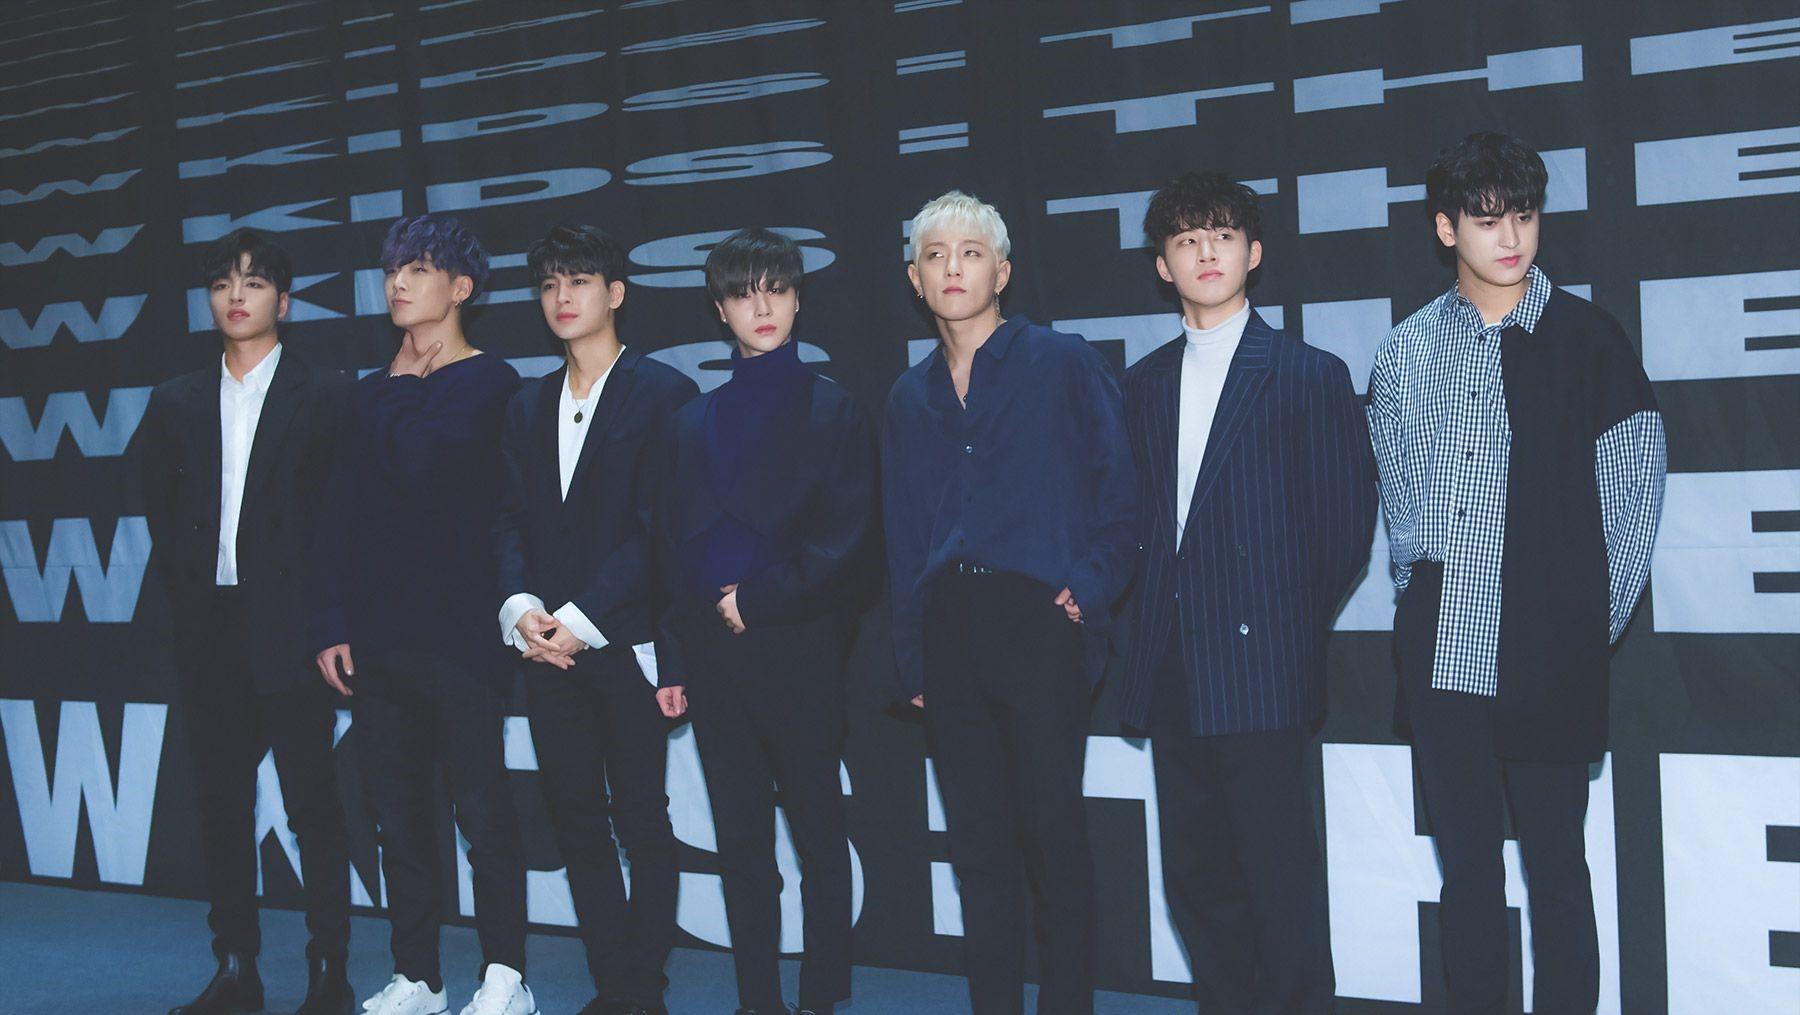 Do You Know About iKON MV? (iKON MV Quiz)